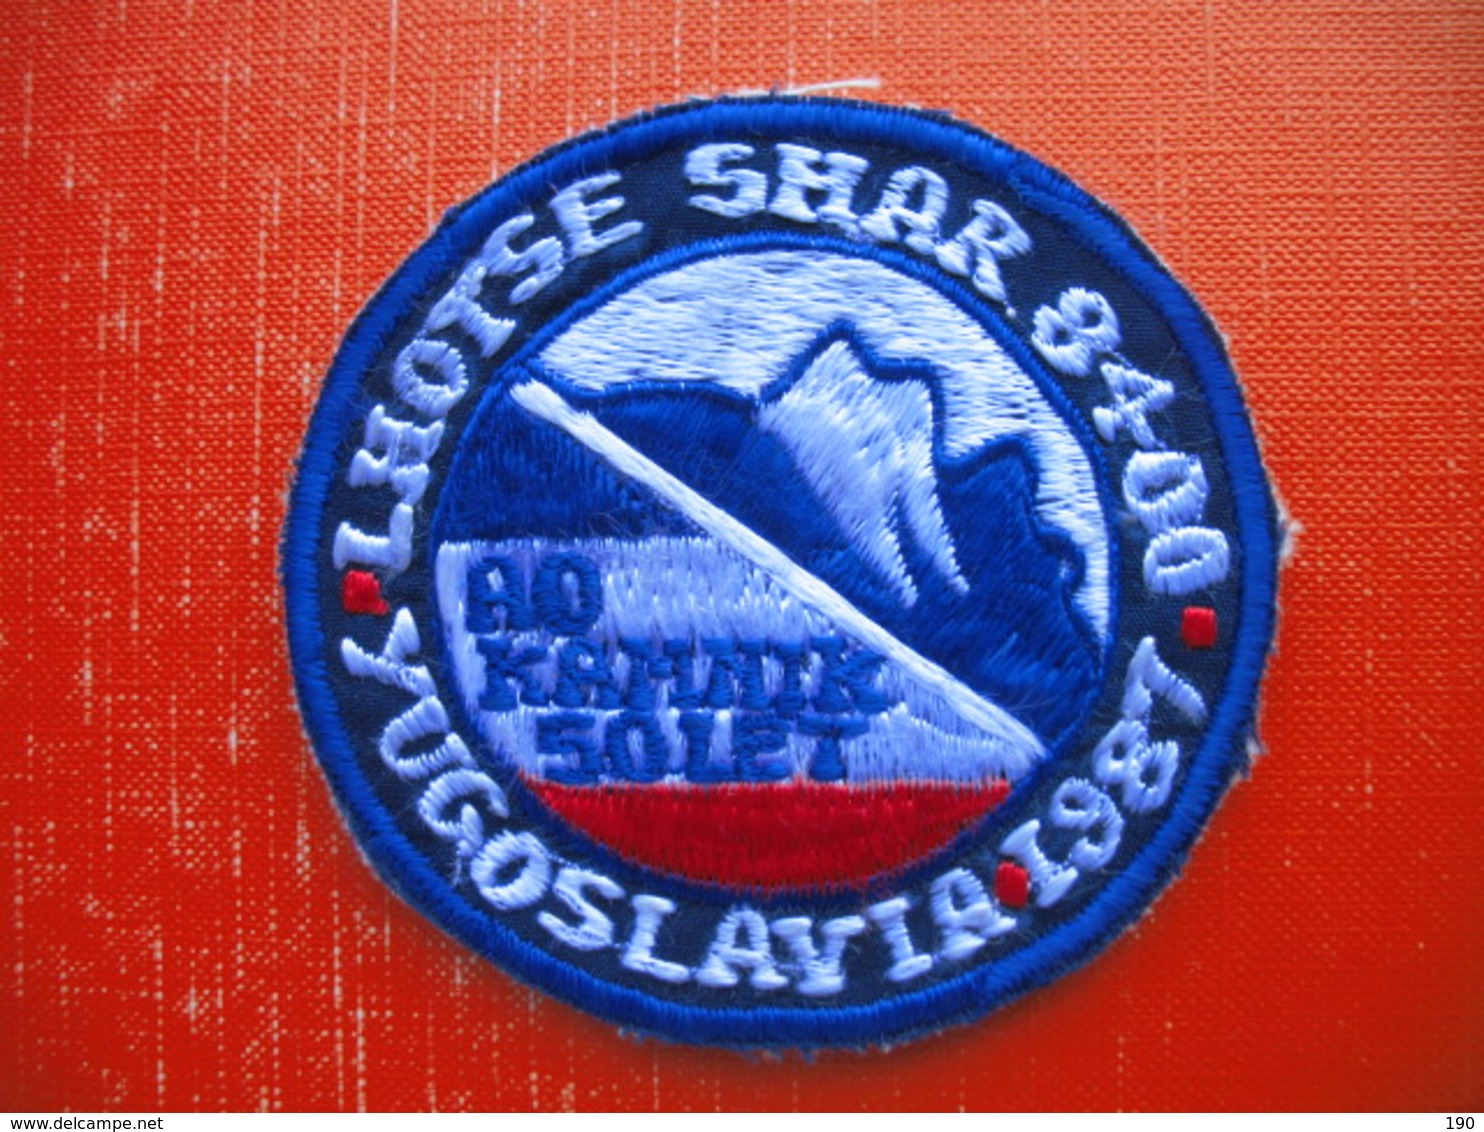 AO KAMNIK 50 LET-YUGOSLAVIA.LHOTSE SHAR 8400(mountain Climbing) - Patches